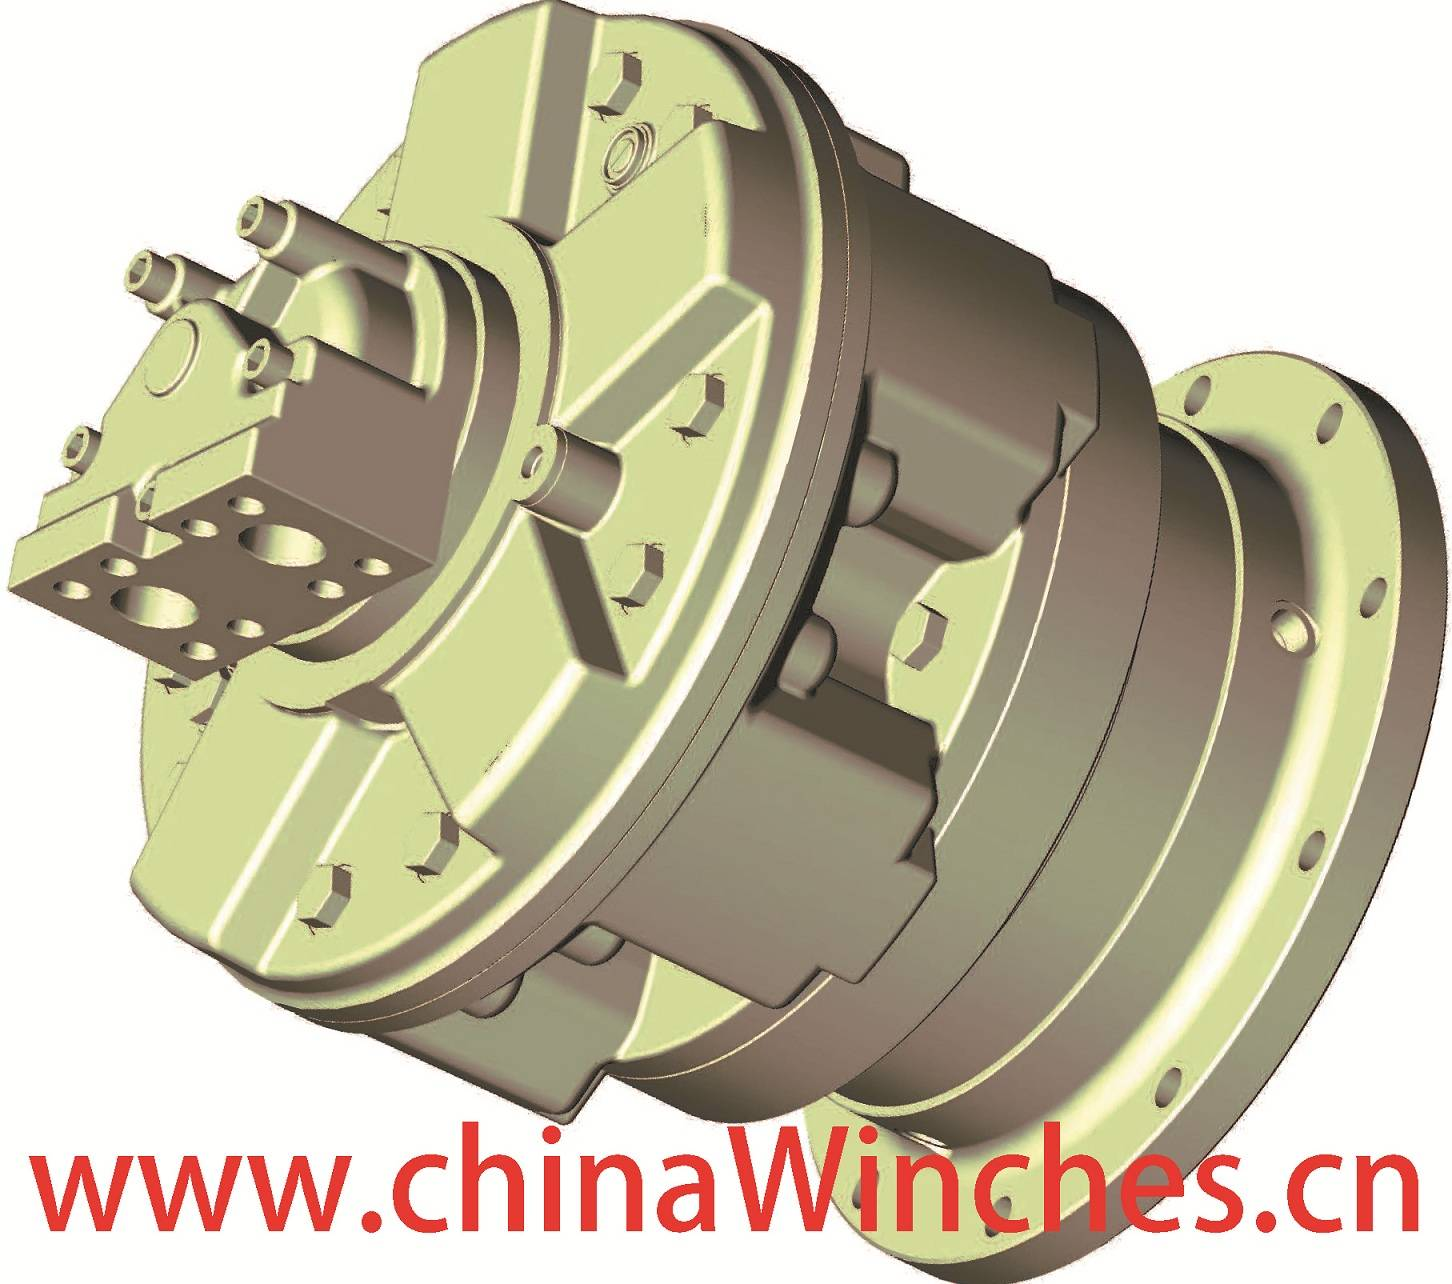 Hydraulic motor GM05 GM1 GM2 GM3 GM4 GM5 + R13 R20 R21 R24 R28 WR10 WR20 Sai GM Gearbox